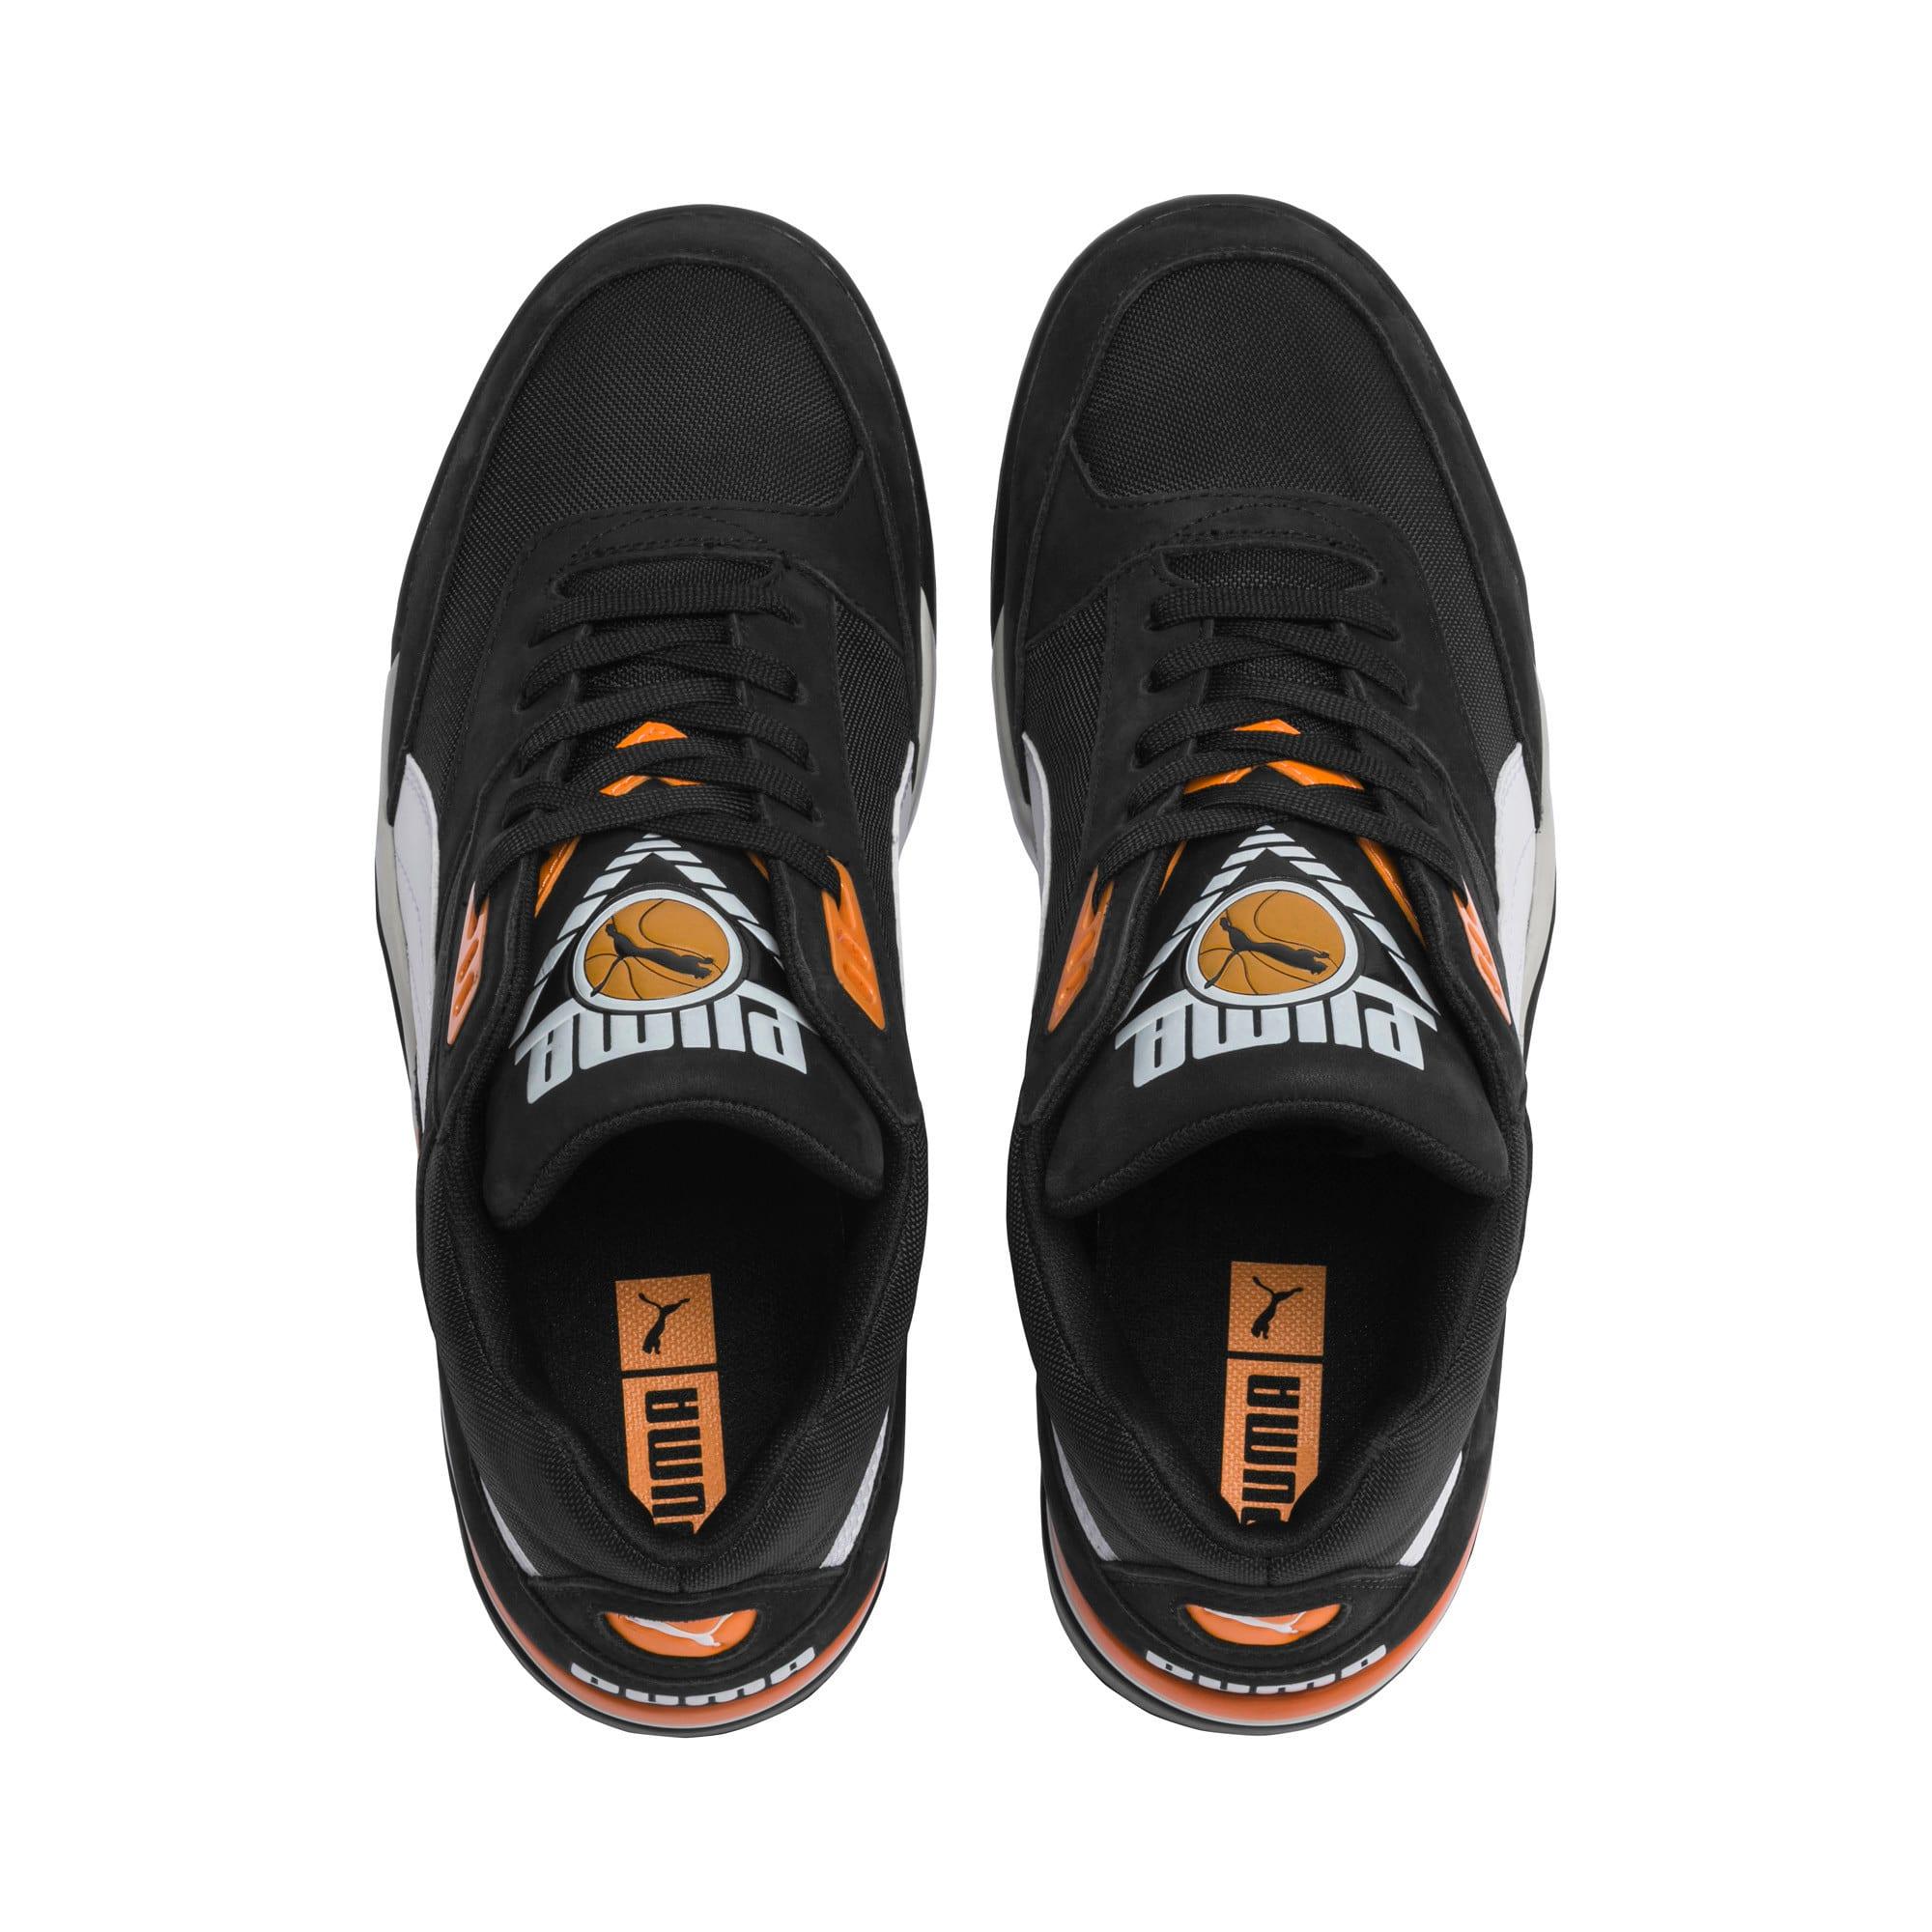 Thumbnail 6 of Palace Guard Bad Boys Sneaker, Puma Black-Puma White-, medium